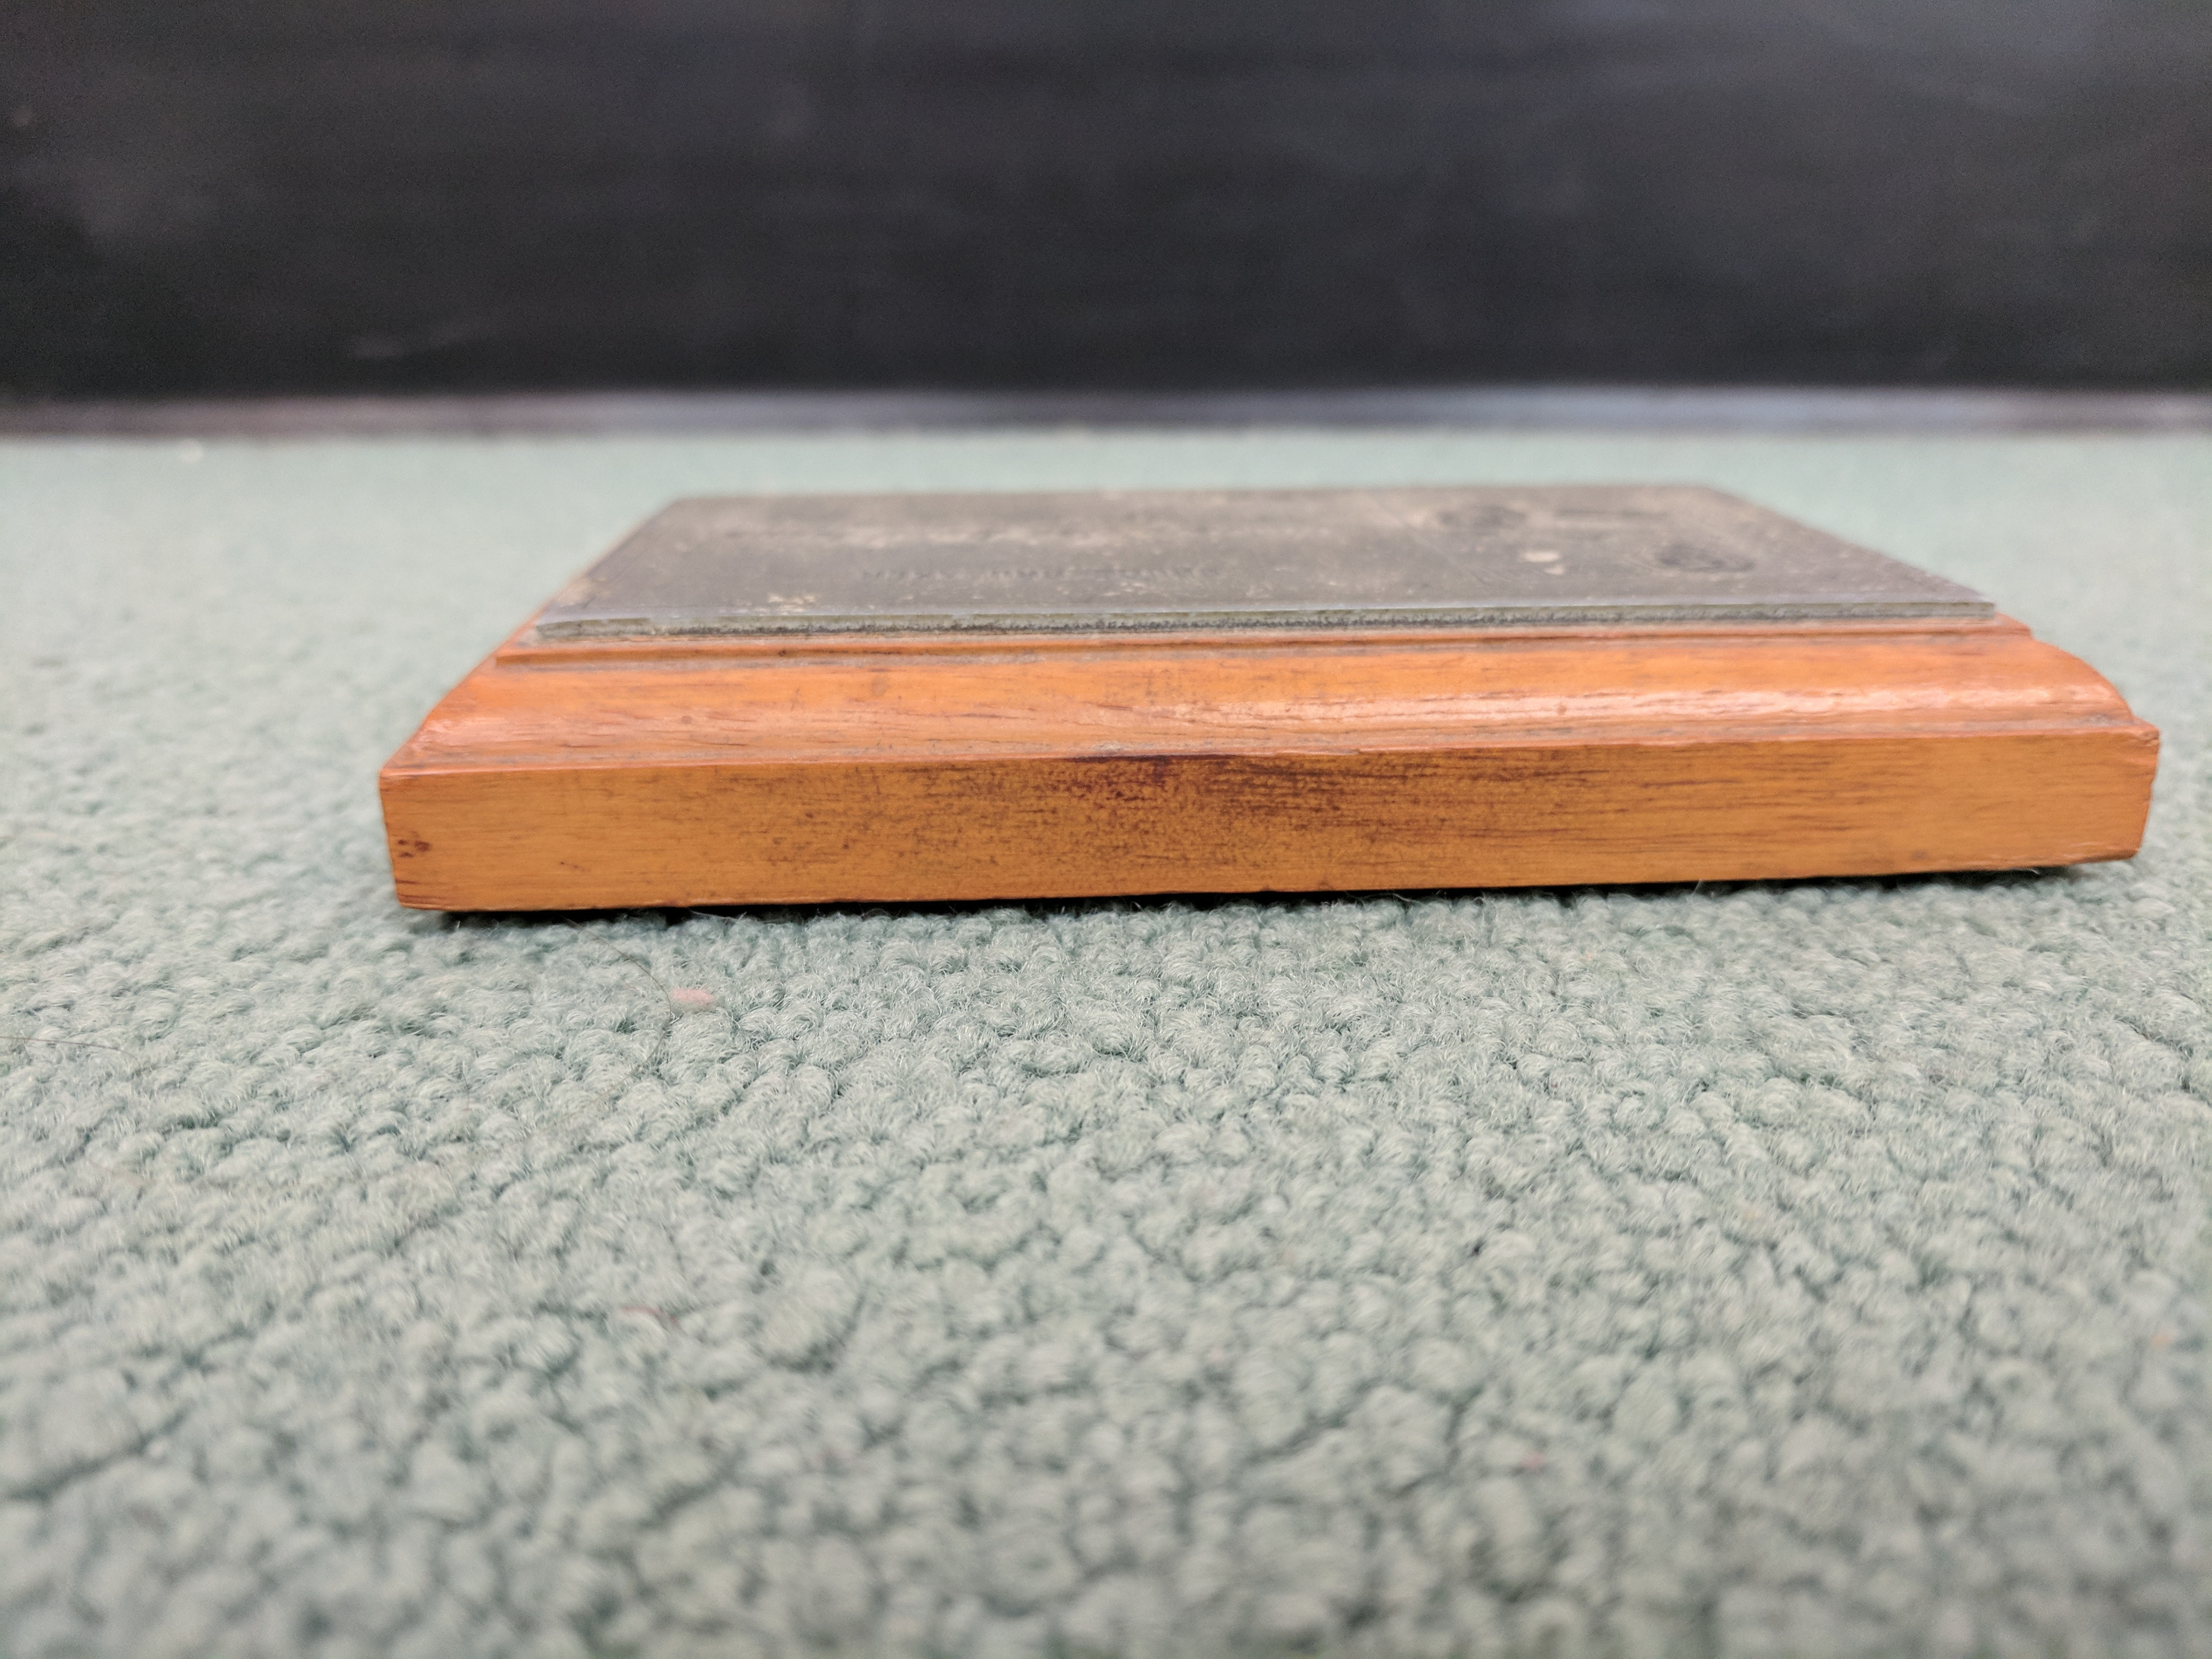 hardwood floor refinishing greenville nc of cdatamadison historical pertaining to 913bff350749b6f28c53ee54249b150c